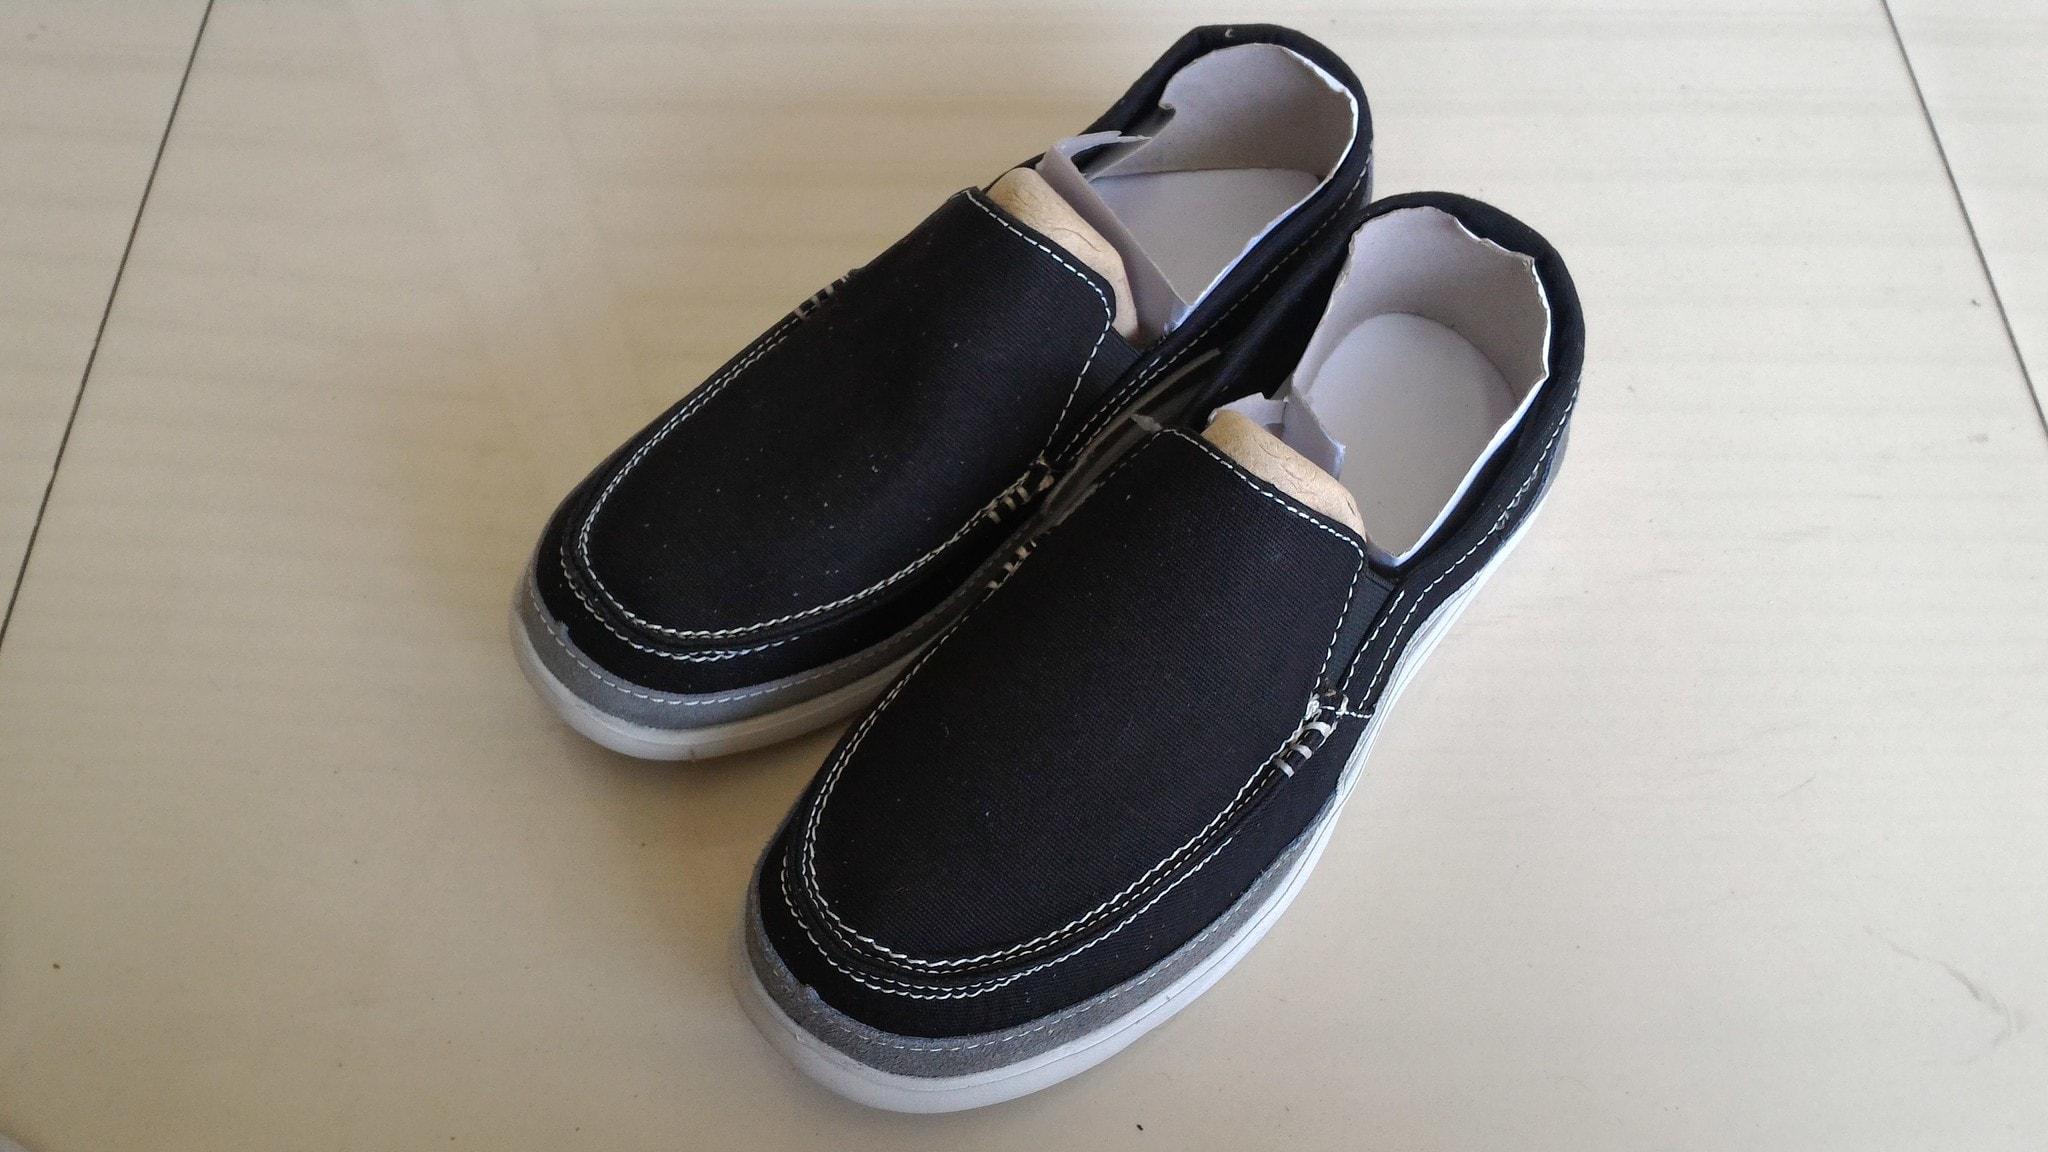 Jual Sepatu Crocs Walu Accent Men Diskon - Laris-Manis-Shop ... 65d96e4cbd